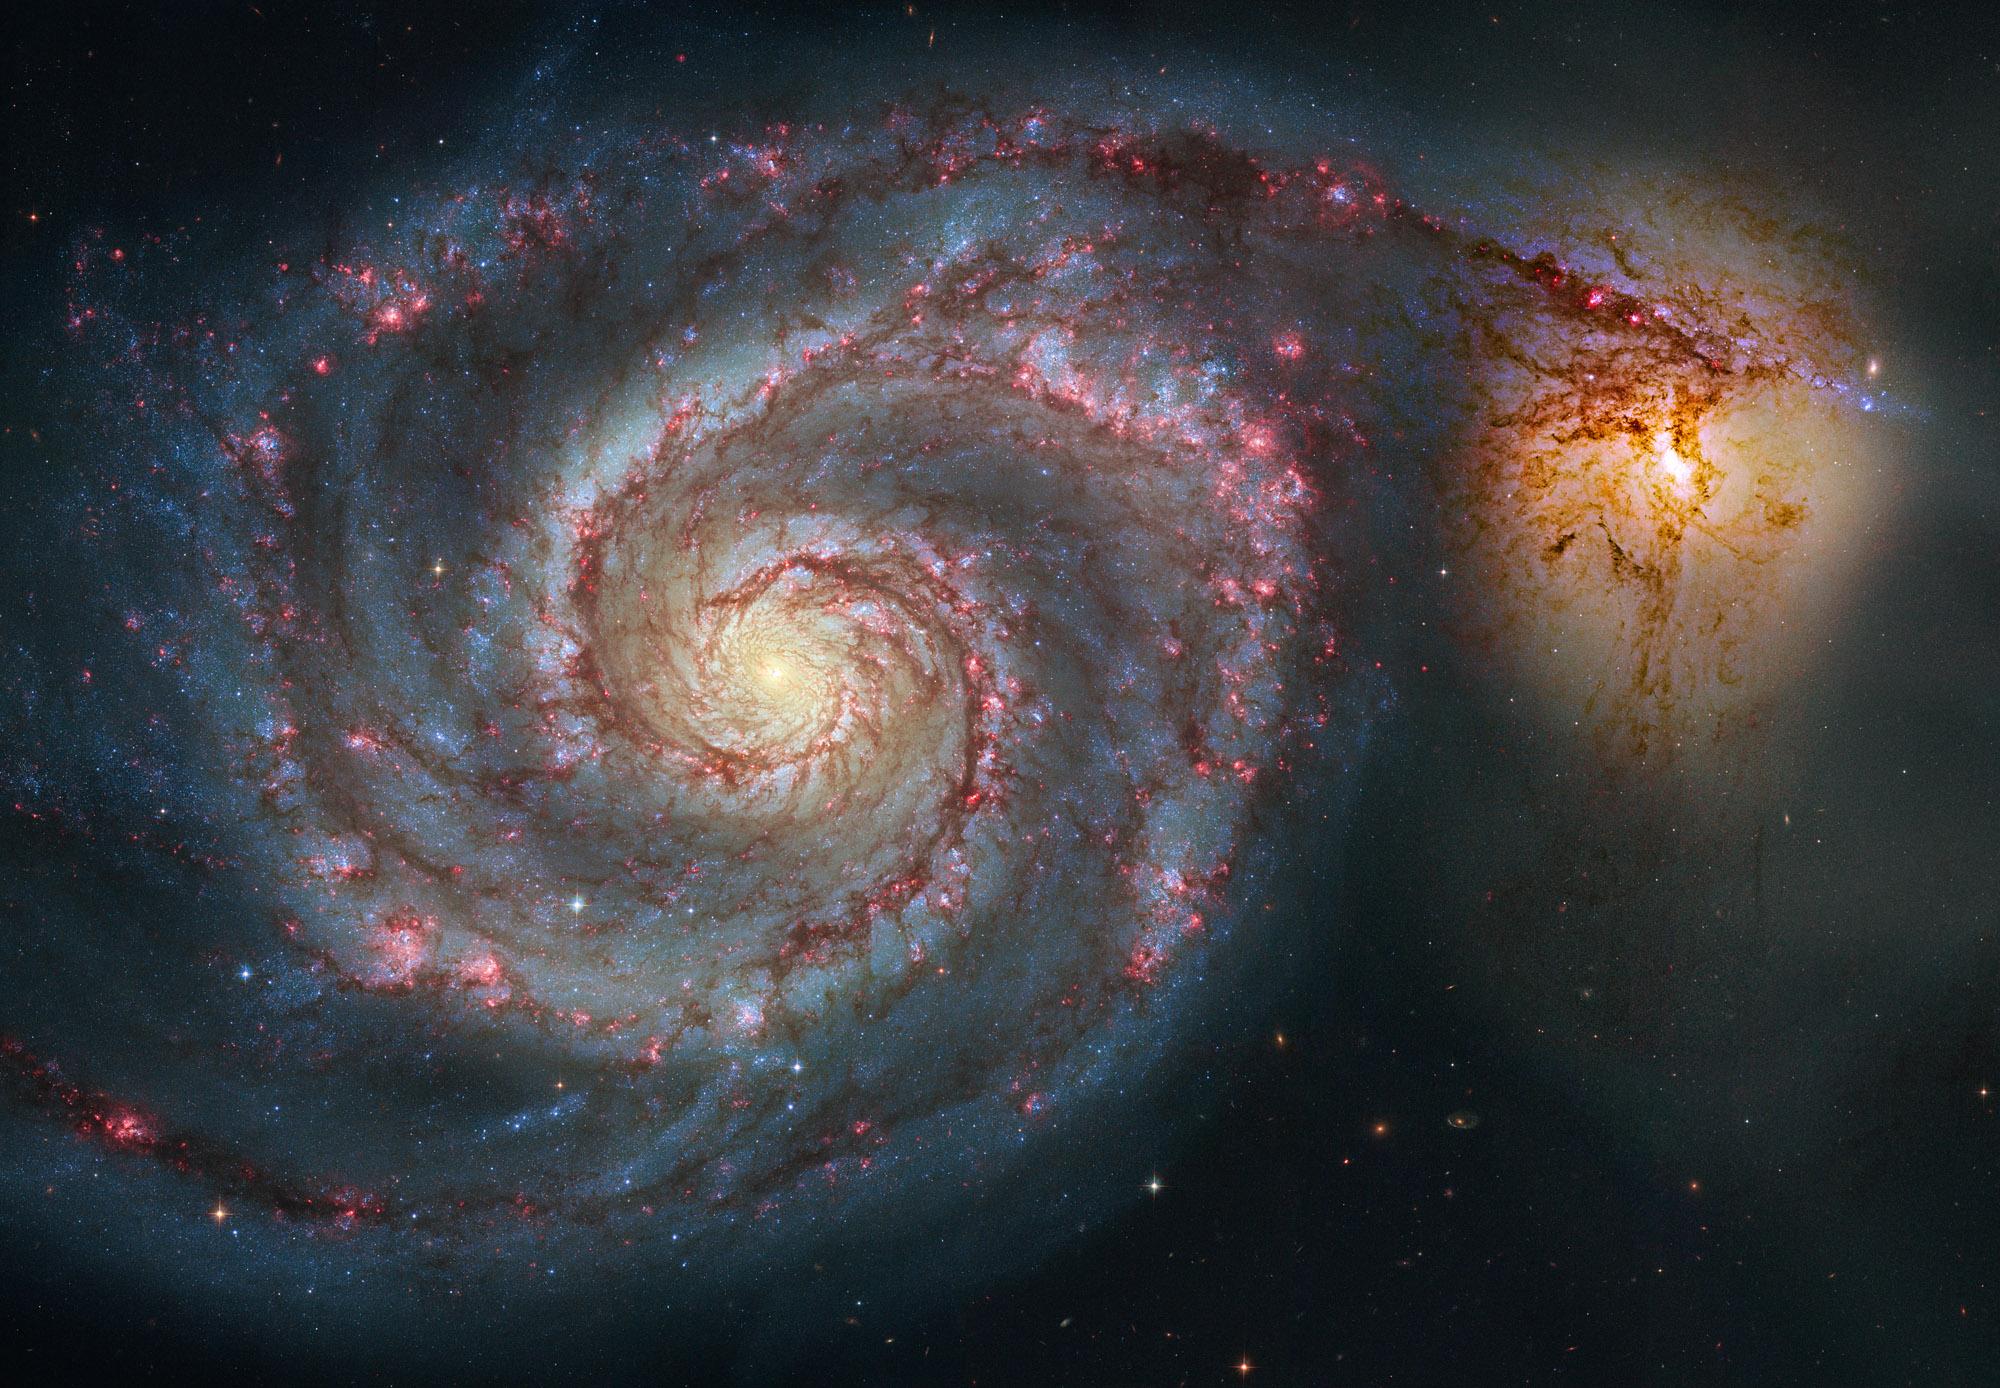 APOD: 2008 June 14 - M51 Hubble Remix